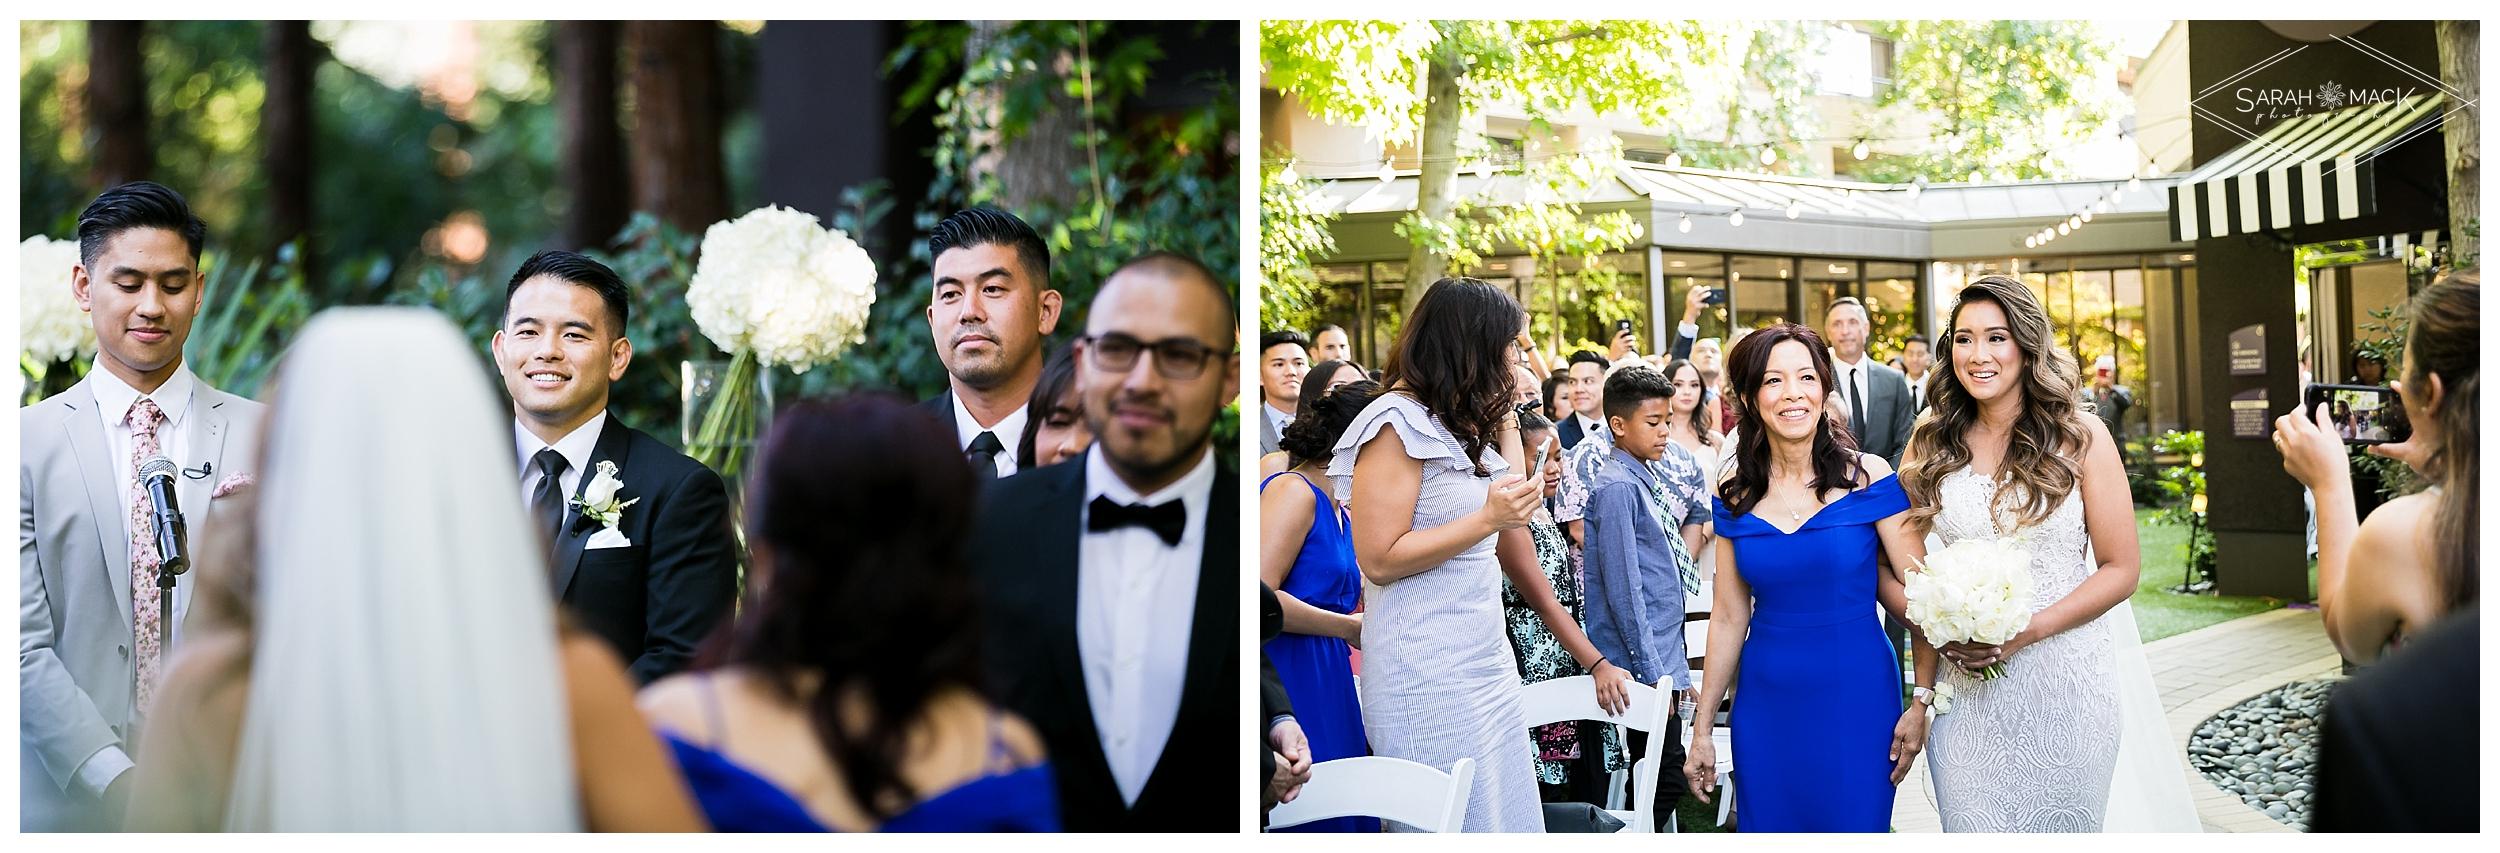 LE-Avenue-of-the-Arts-Costa-Mesa-Wedding-Photography-0143.jpg